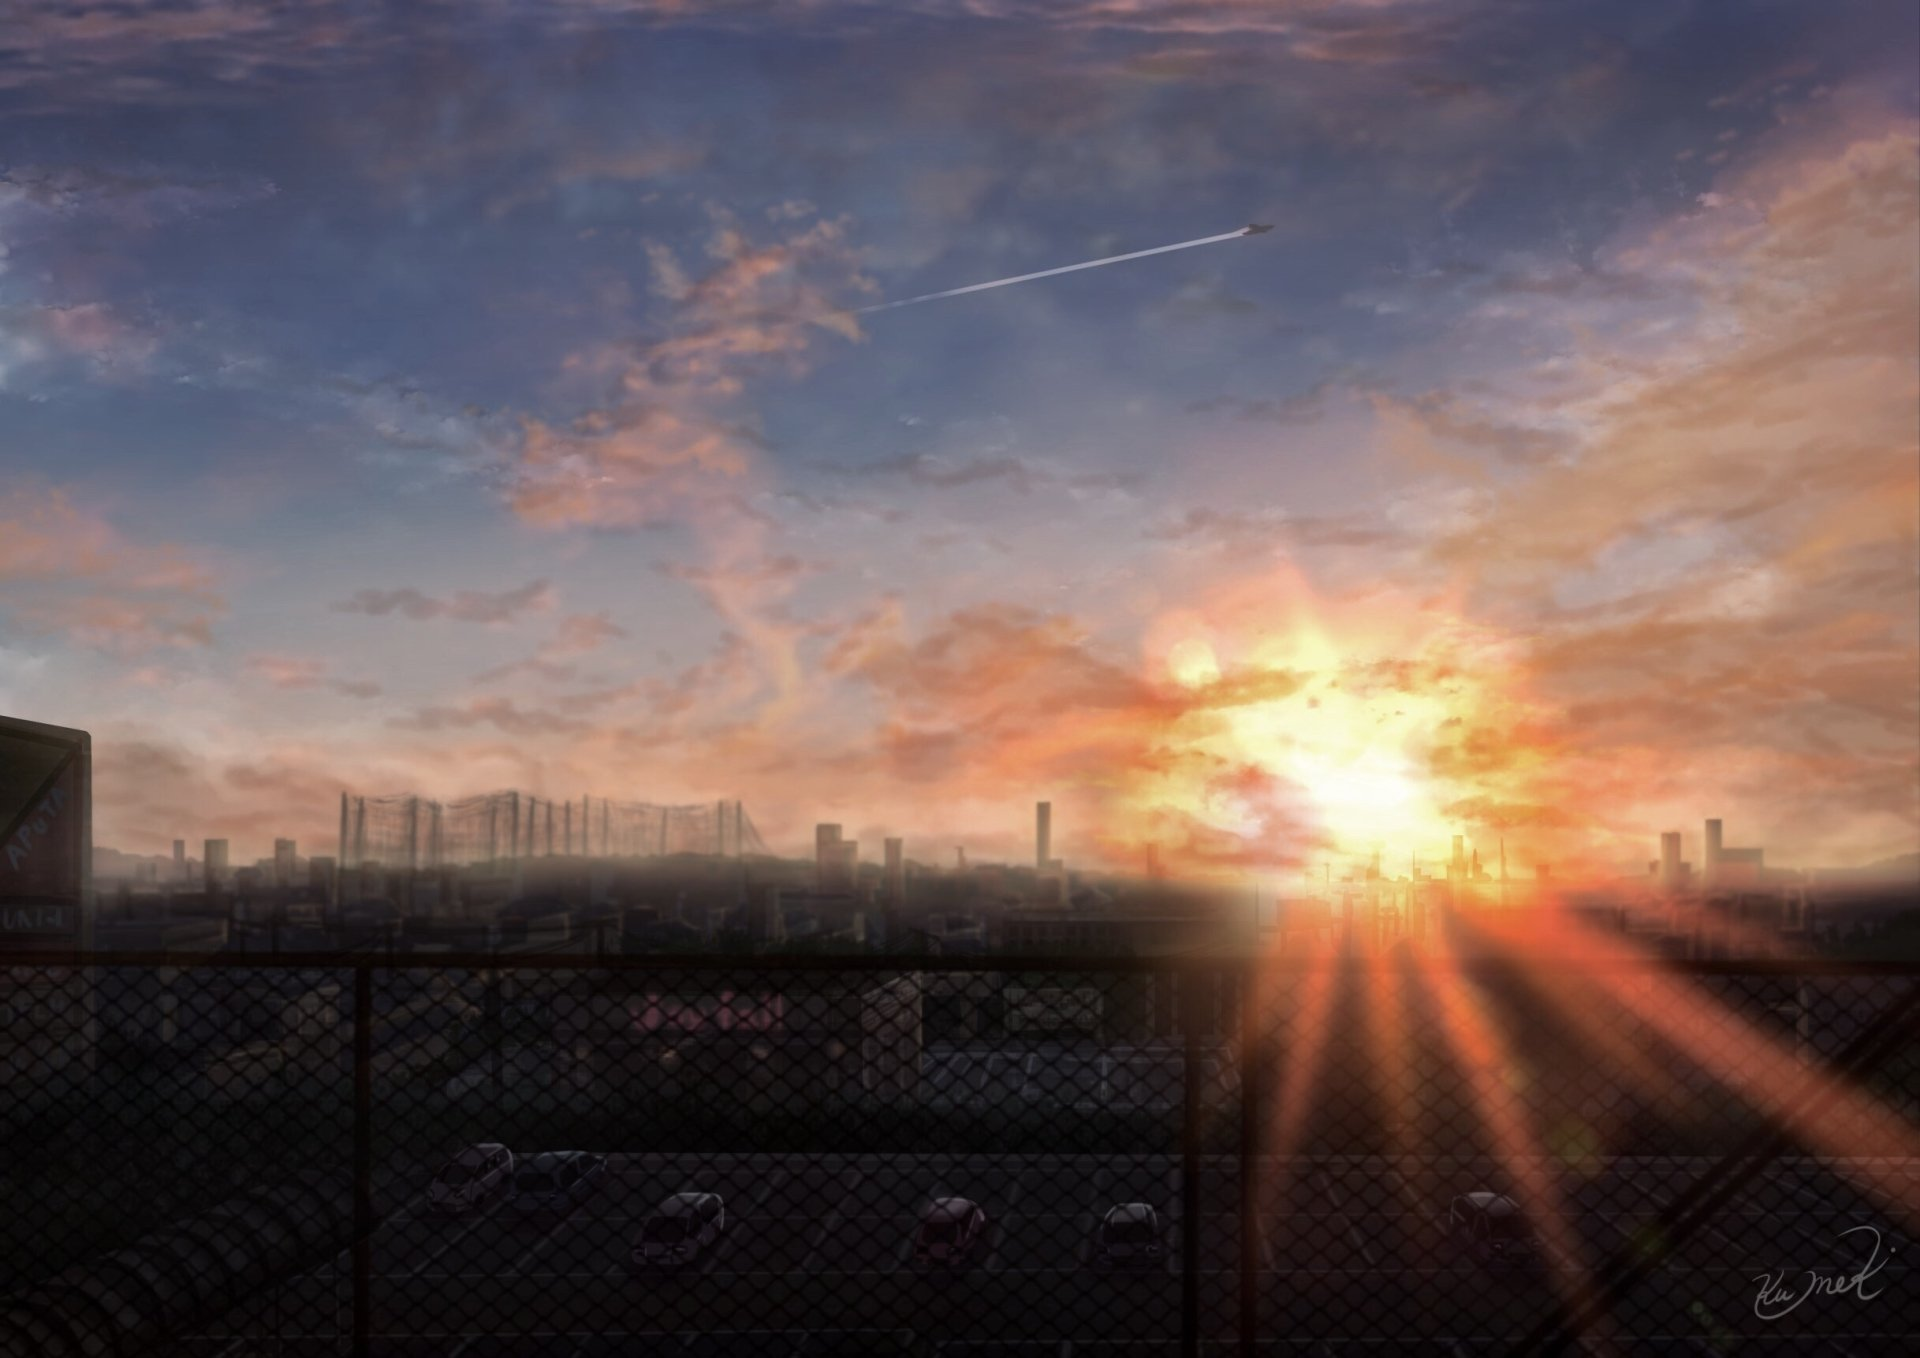 Anime - Original  Sunset Fence City Sky Cloud Parking Lot Wallpaper